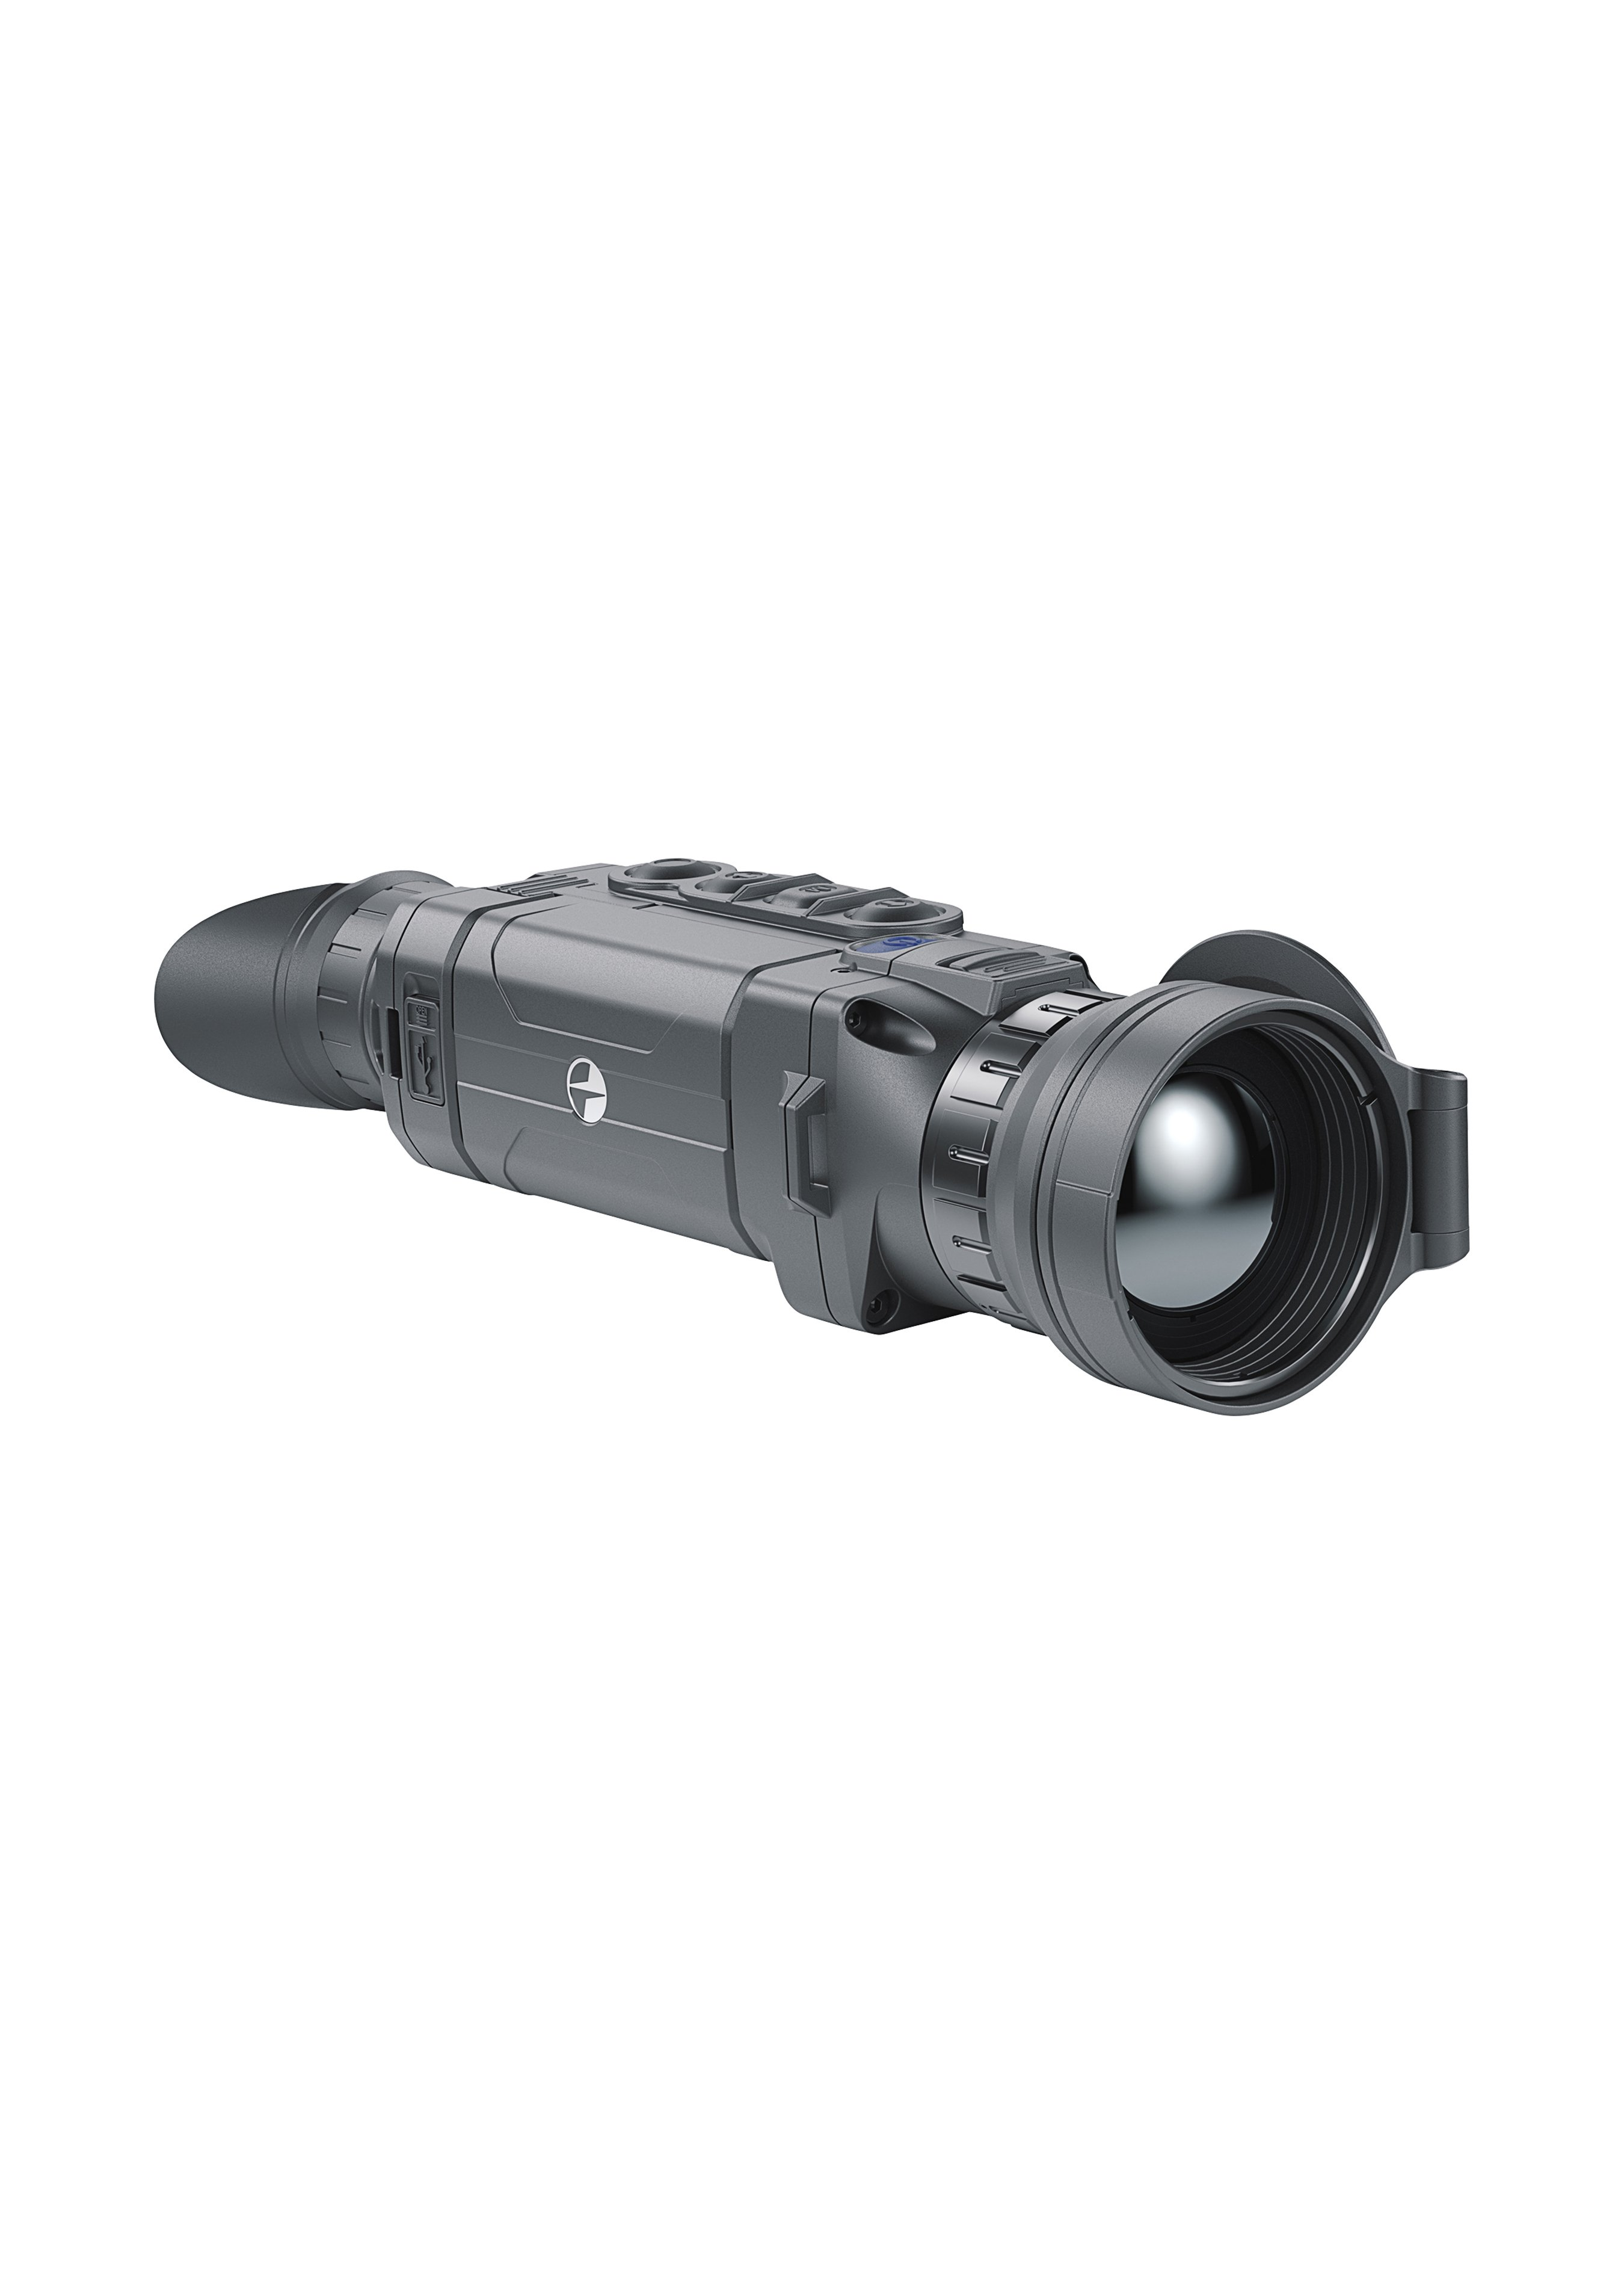 Pulsar Wärmebildkamera Helion-2 XQ50F 199810 1